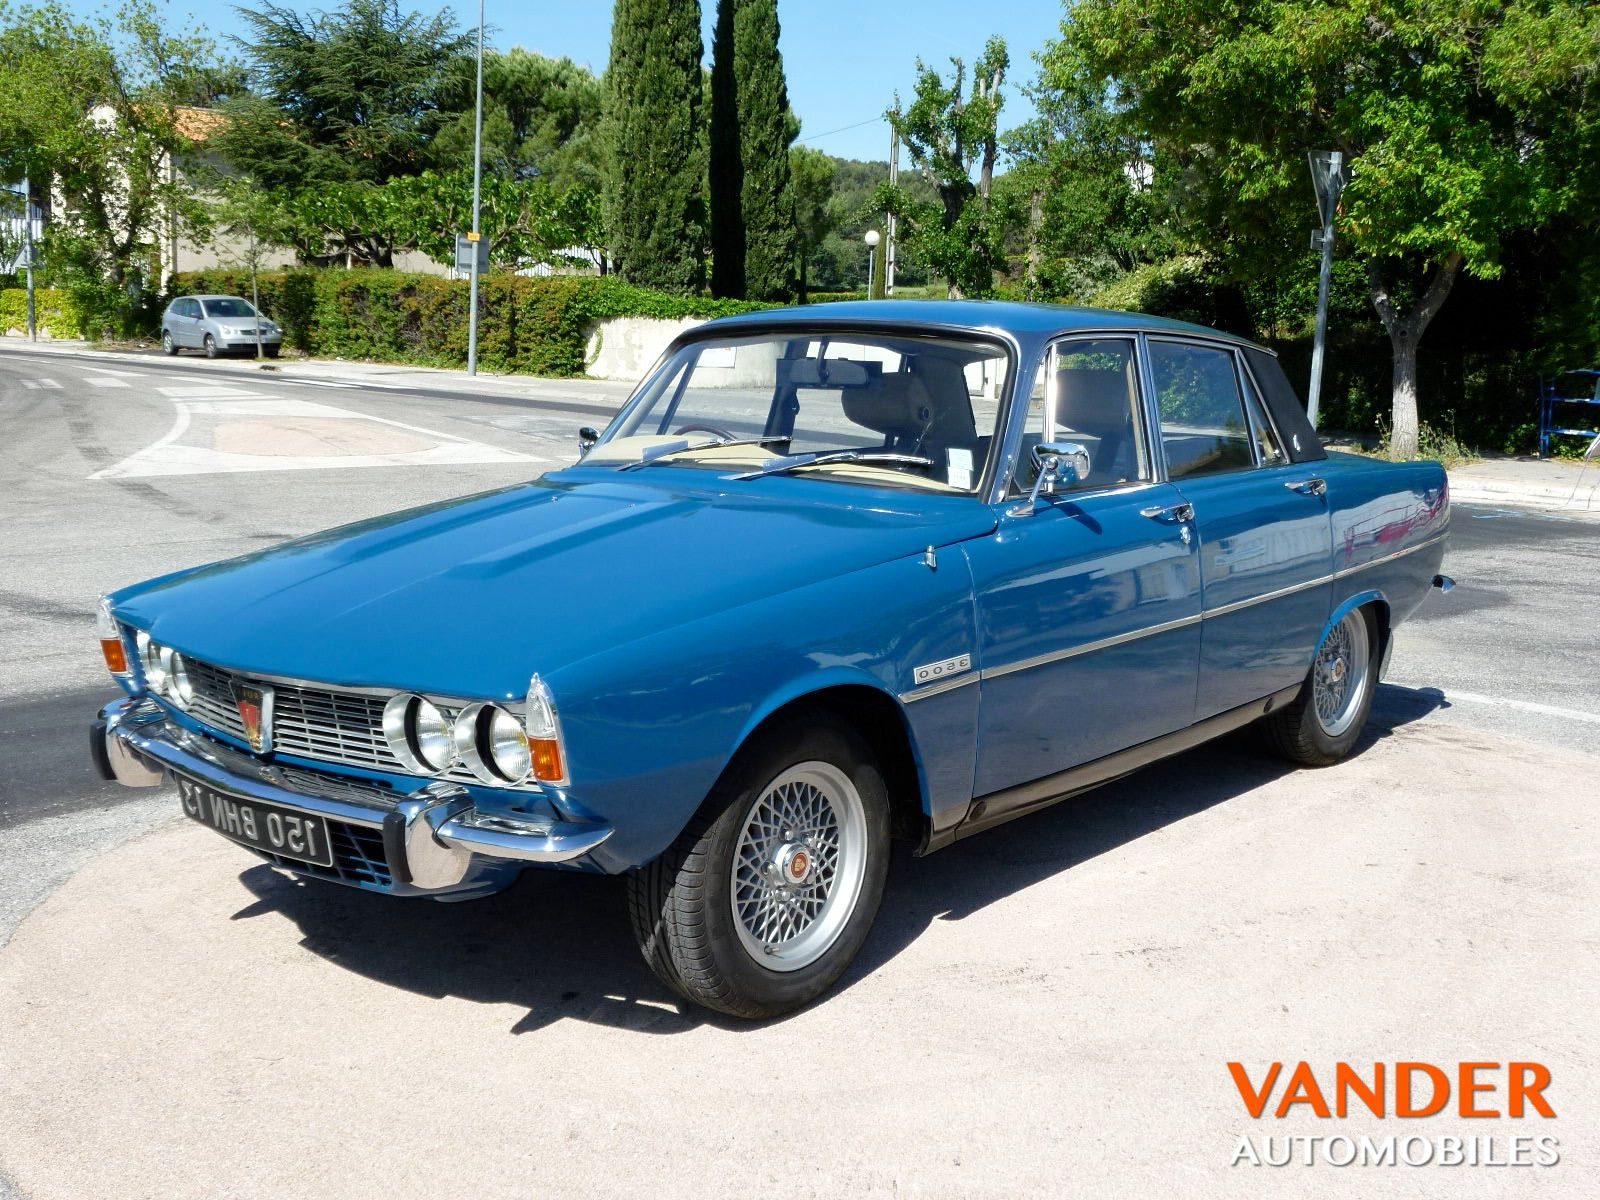 ROVER P6 3500 V8 Vander Automobiles European